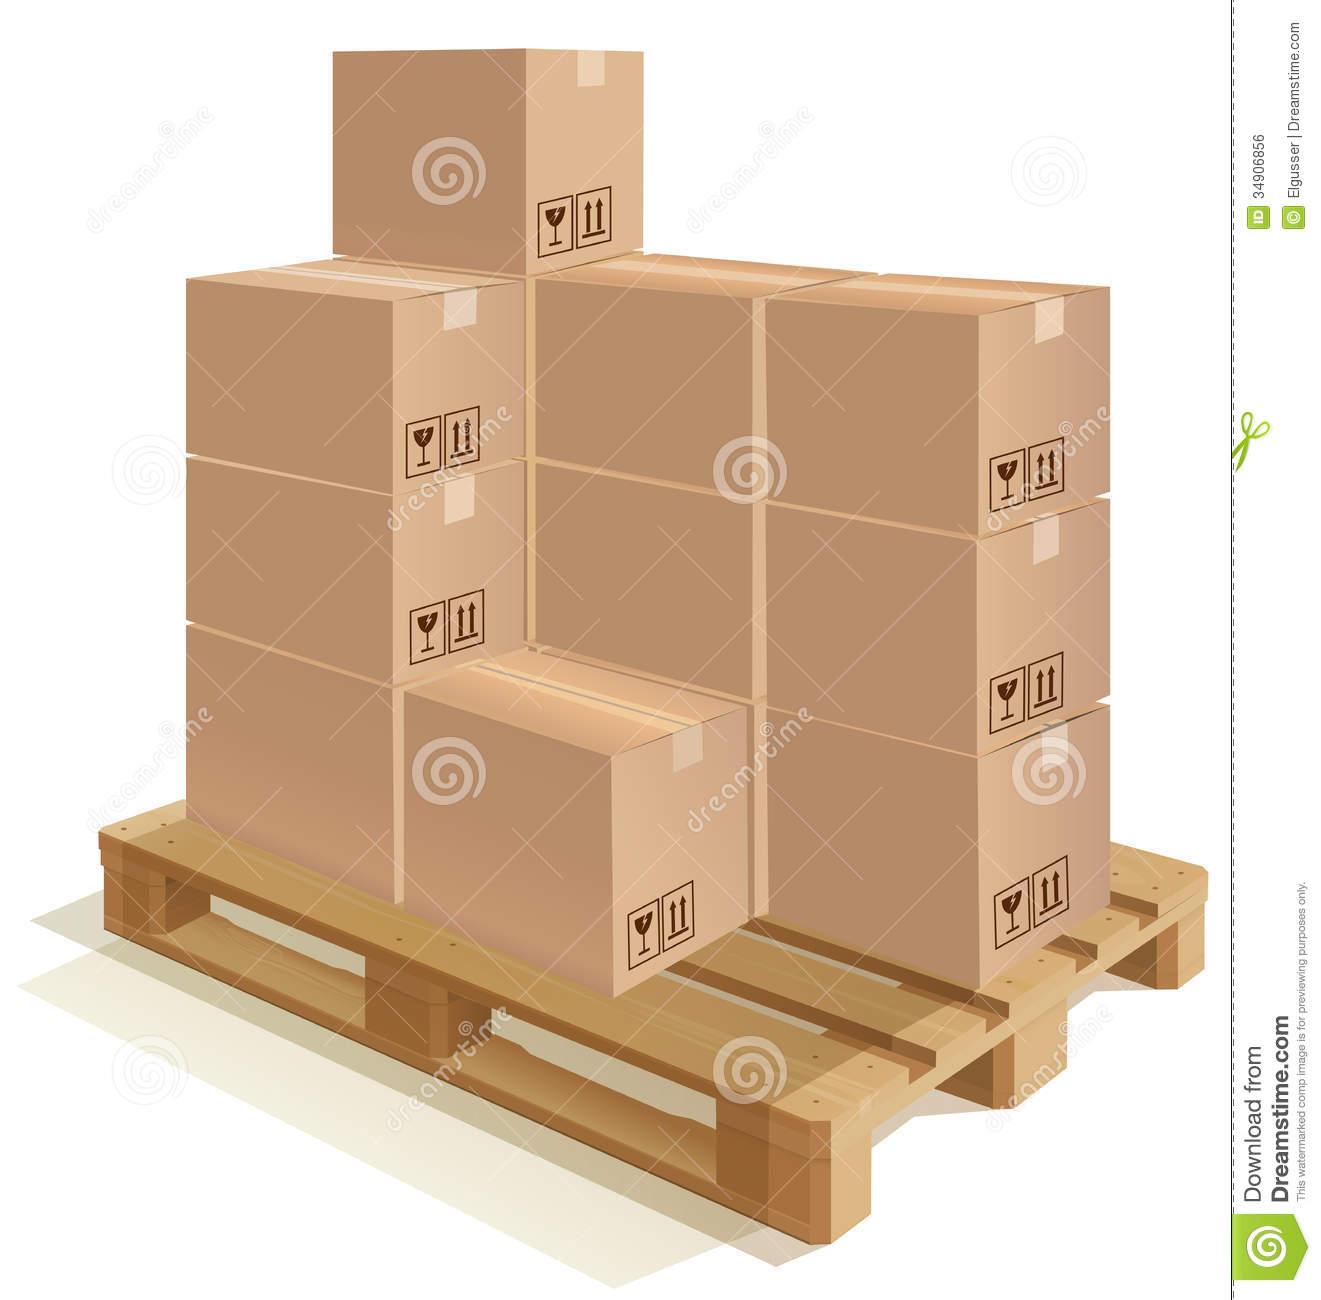 Box clipart pallet, Box pallet Transparent FREE for download.